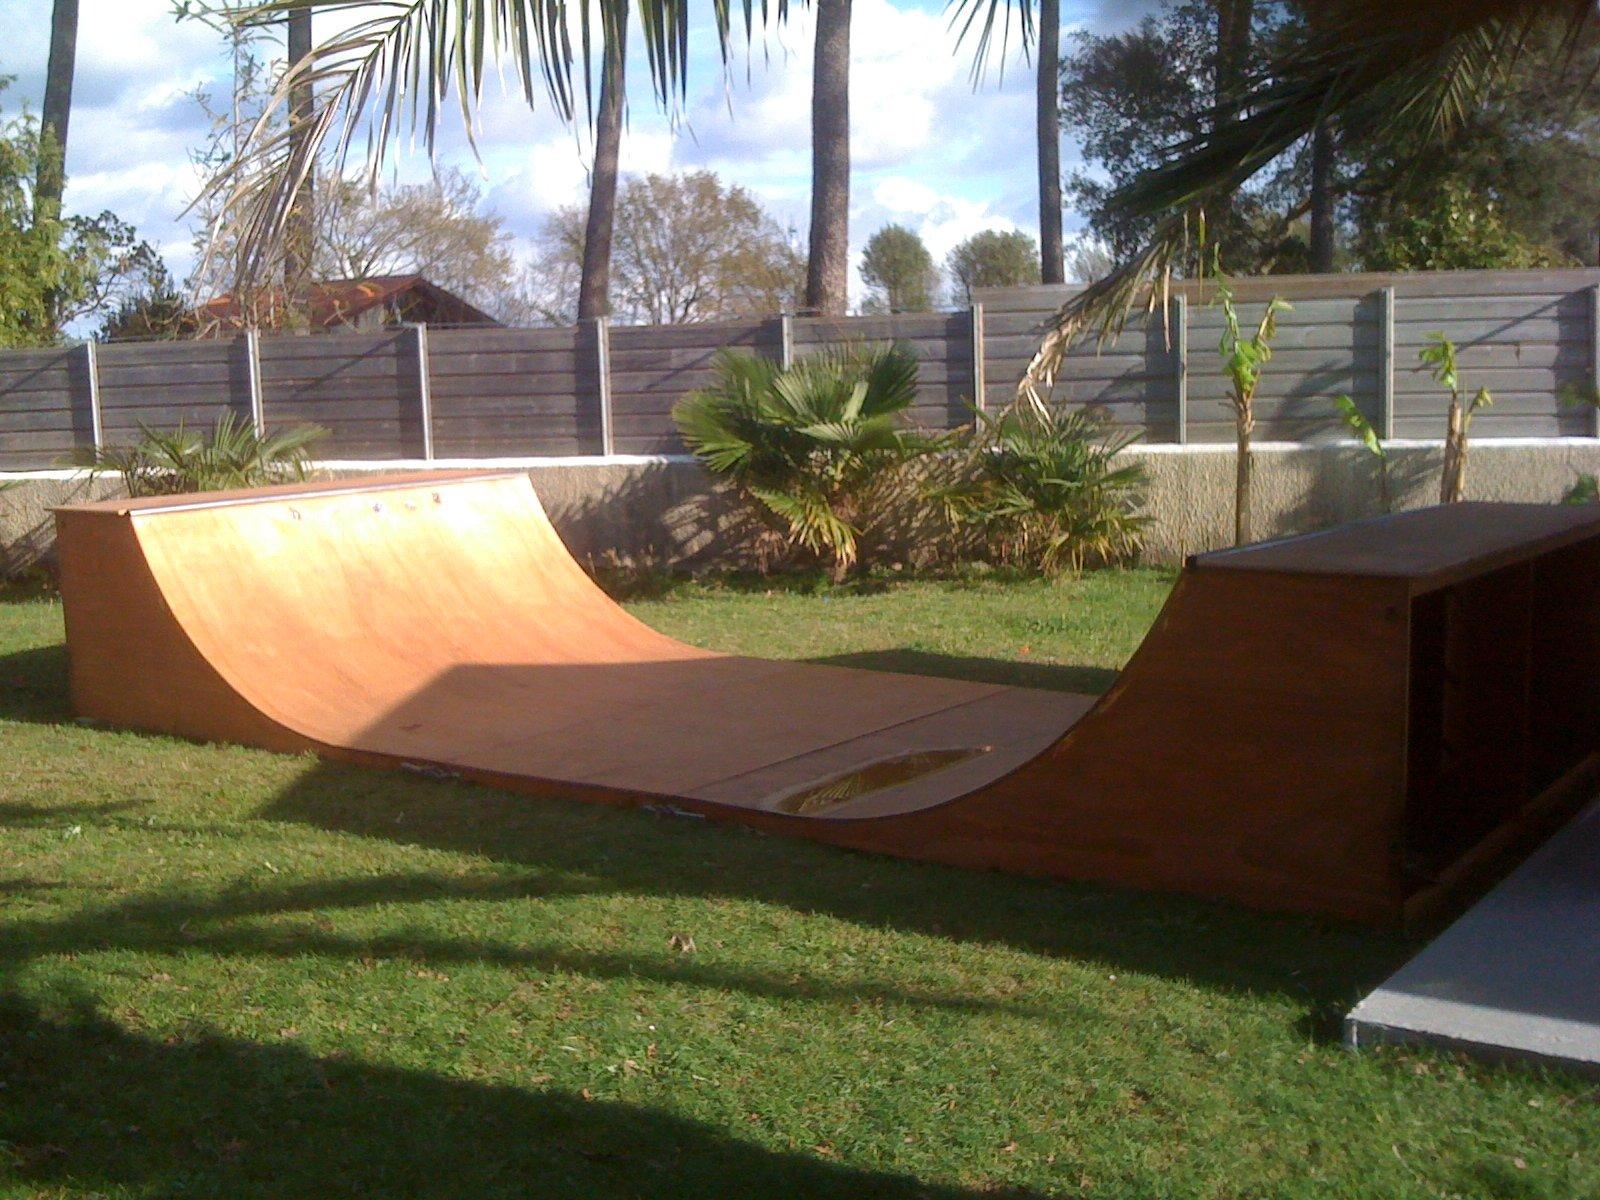 rampe de skate jeux et jouets sur enperdresonlapin. Black Bedroom Furniture Sets. Home Design Ideas